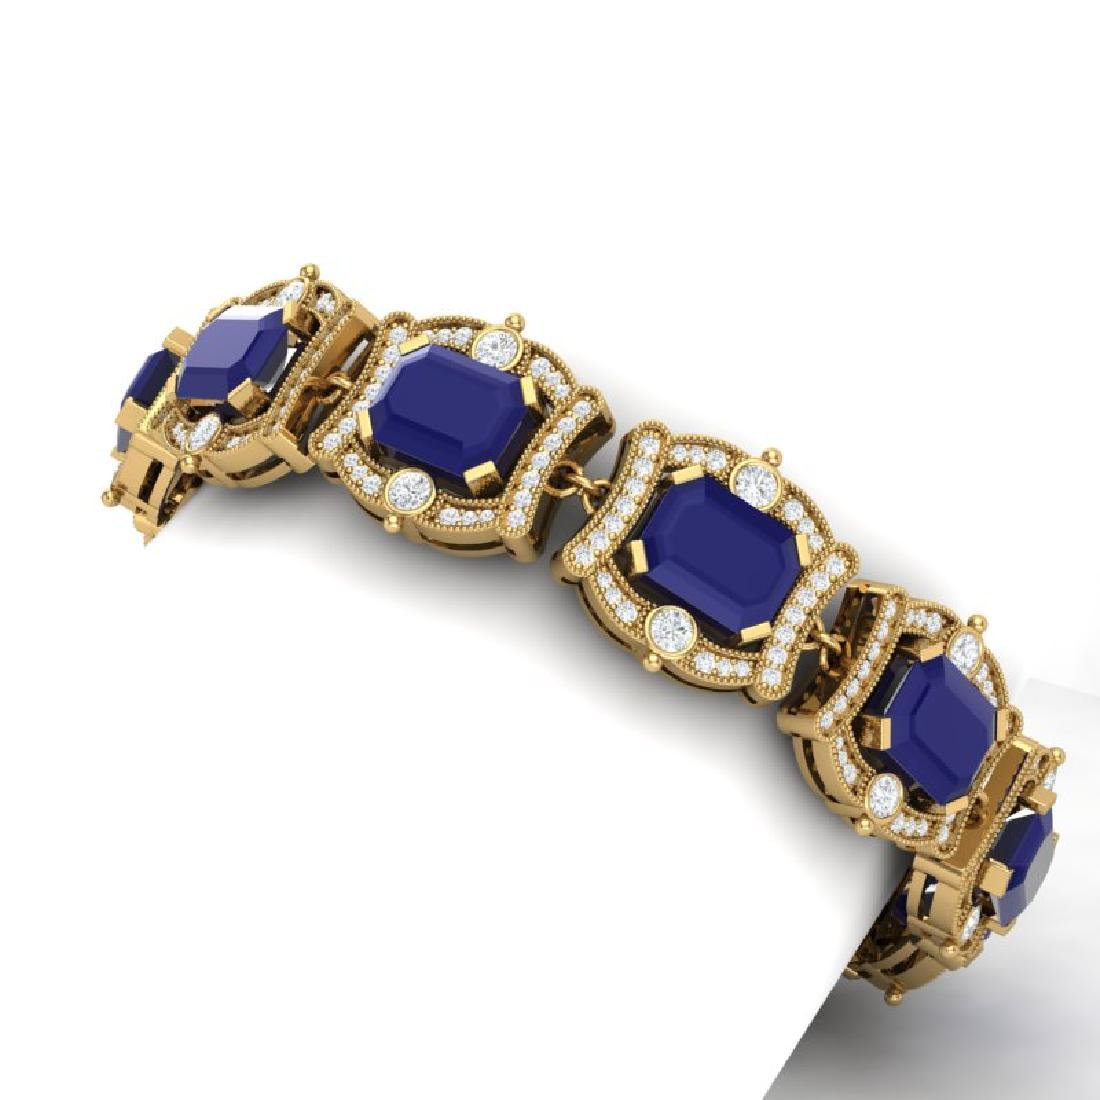 43.87 CTW Royalty Sapphire & VS Diamond Bracelet 18K - 2